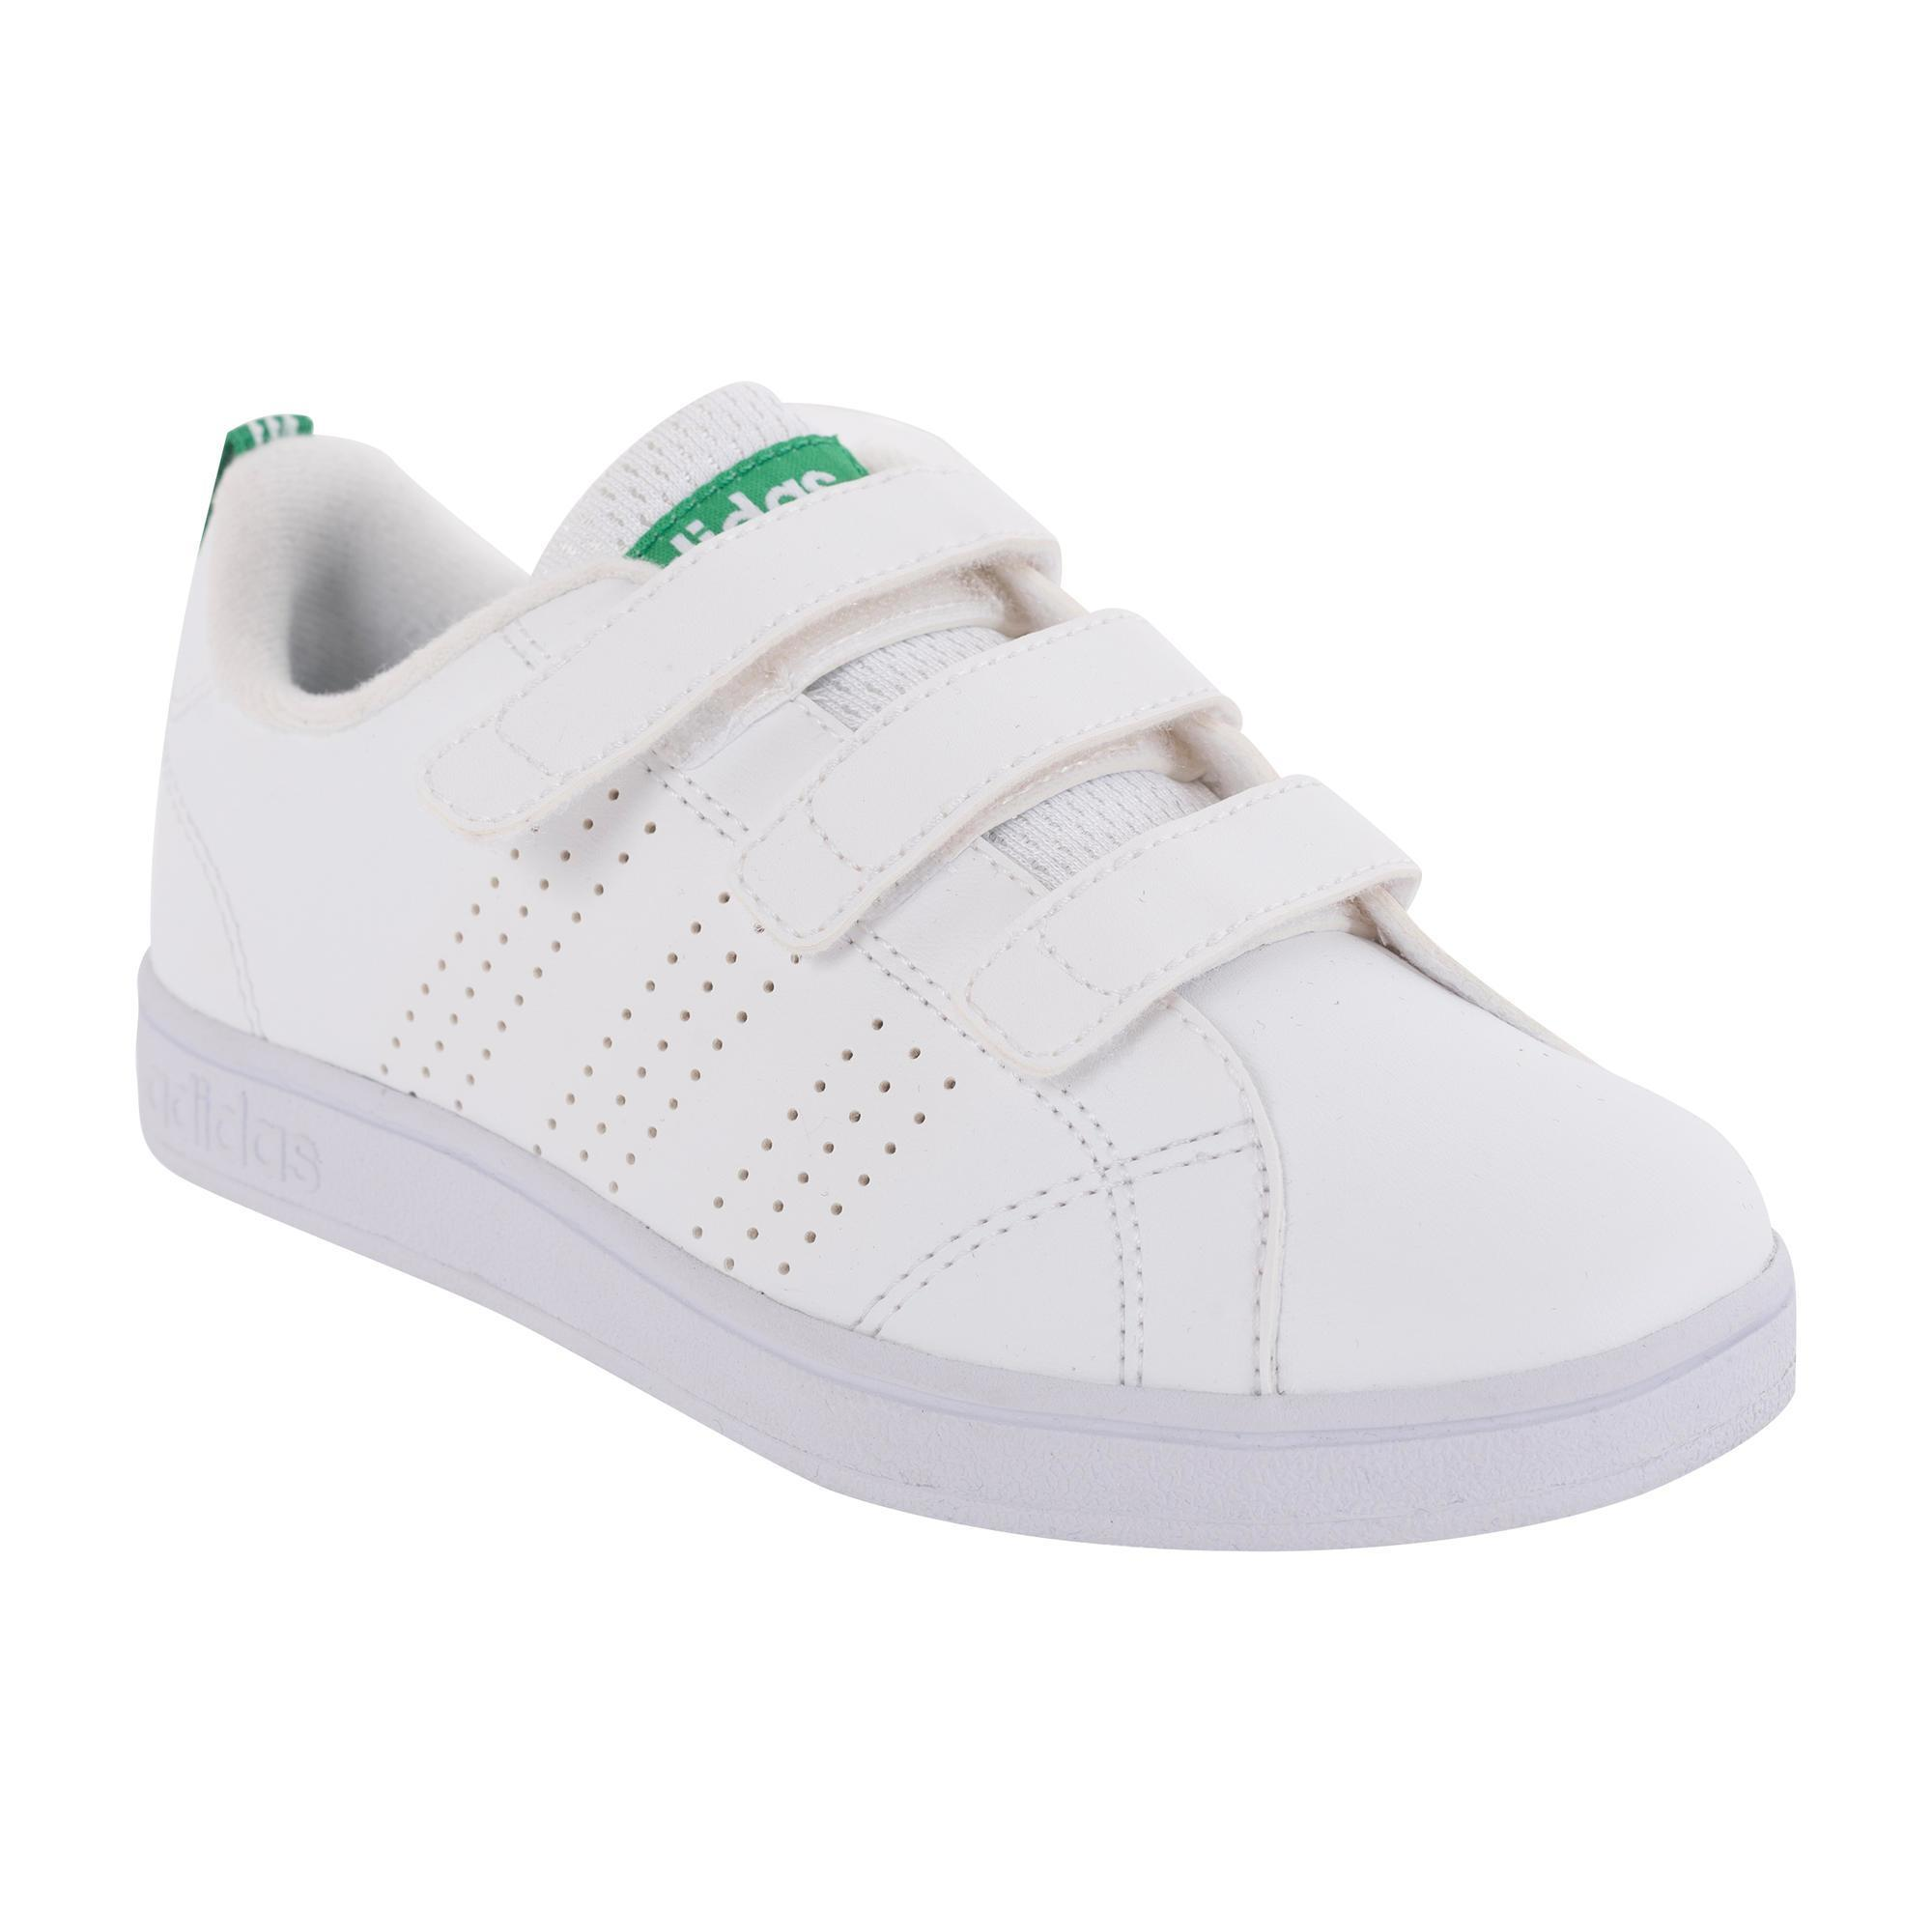 Clean Vert Chaussures Adidas Blanc Advantage Enfant Tennis Neo De B8dxqdwY 4632ed4ef36db